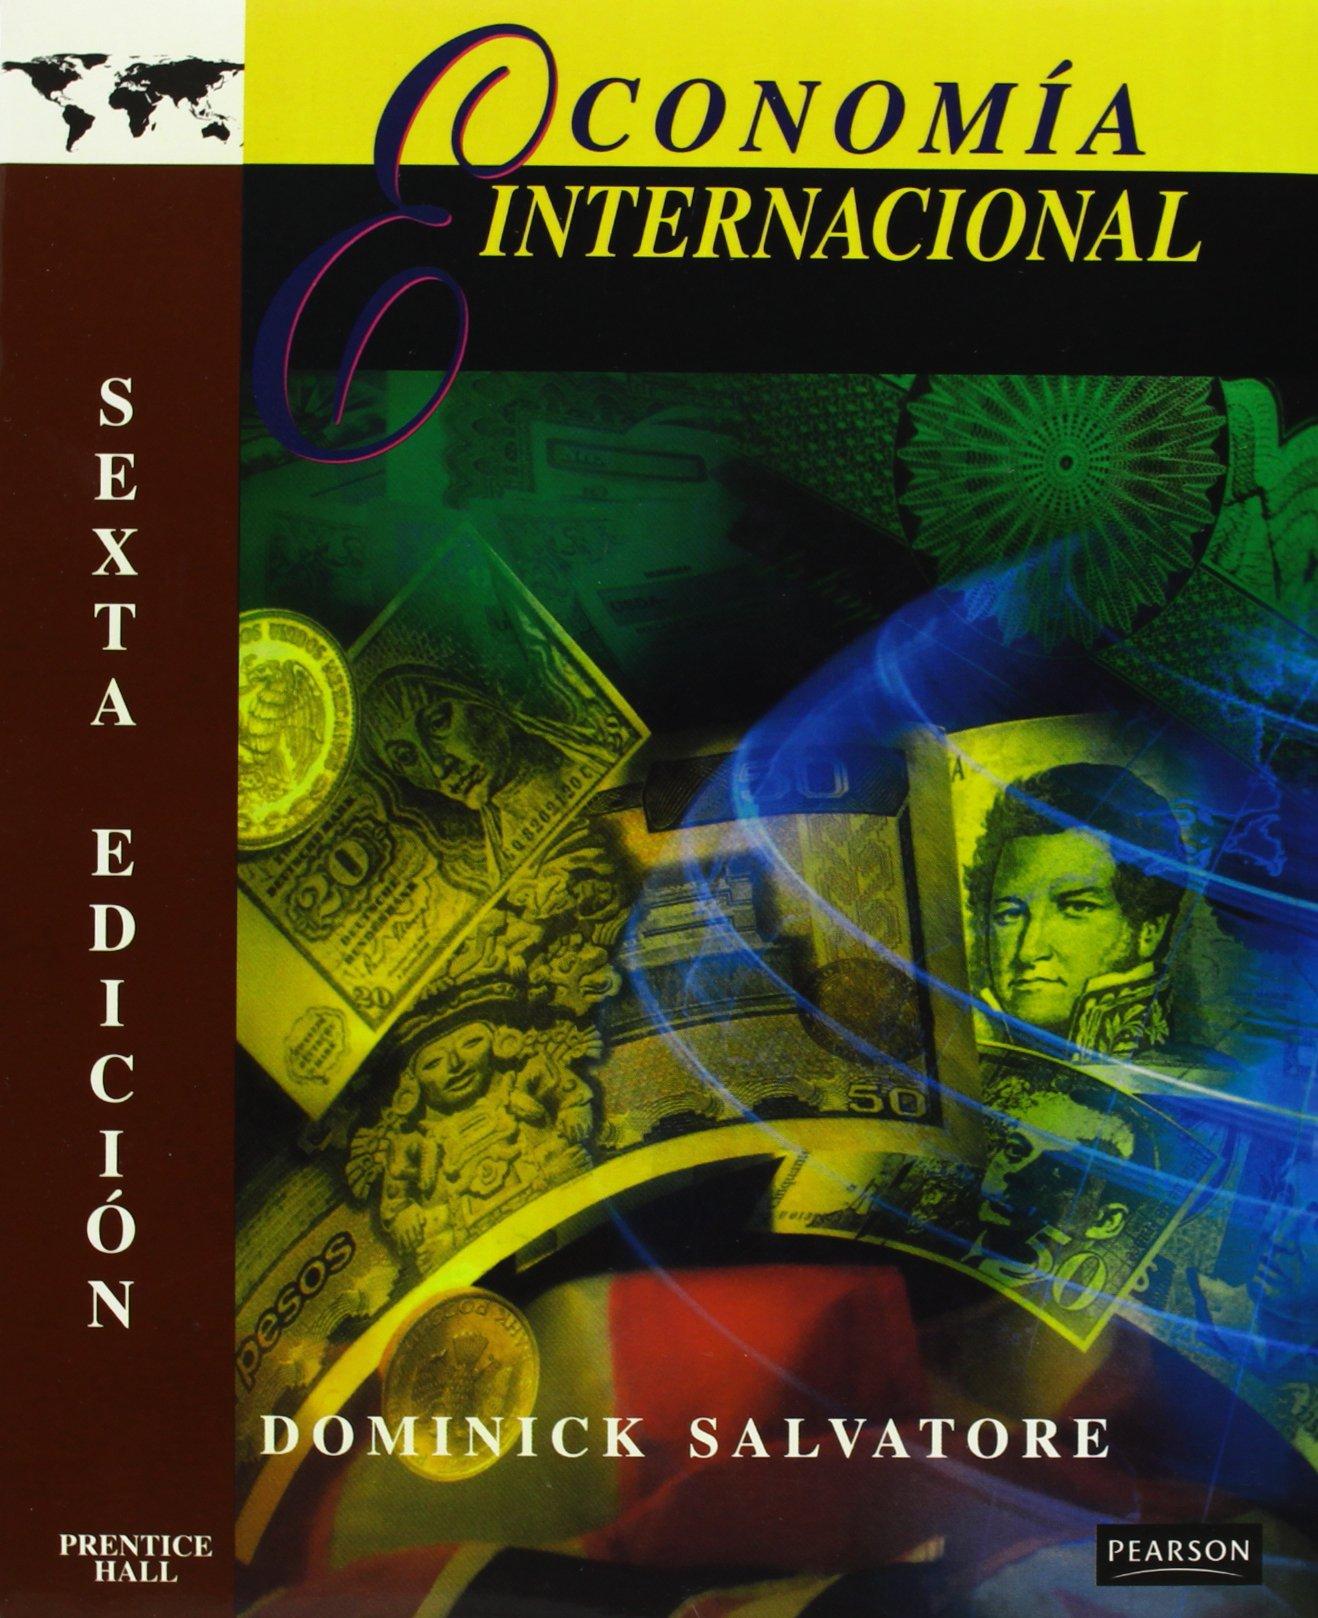 Economia internacional 6 edicion spanish edition dominick salvatore 9789701702710 amazon com books